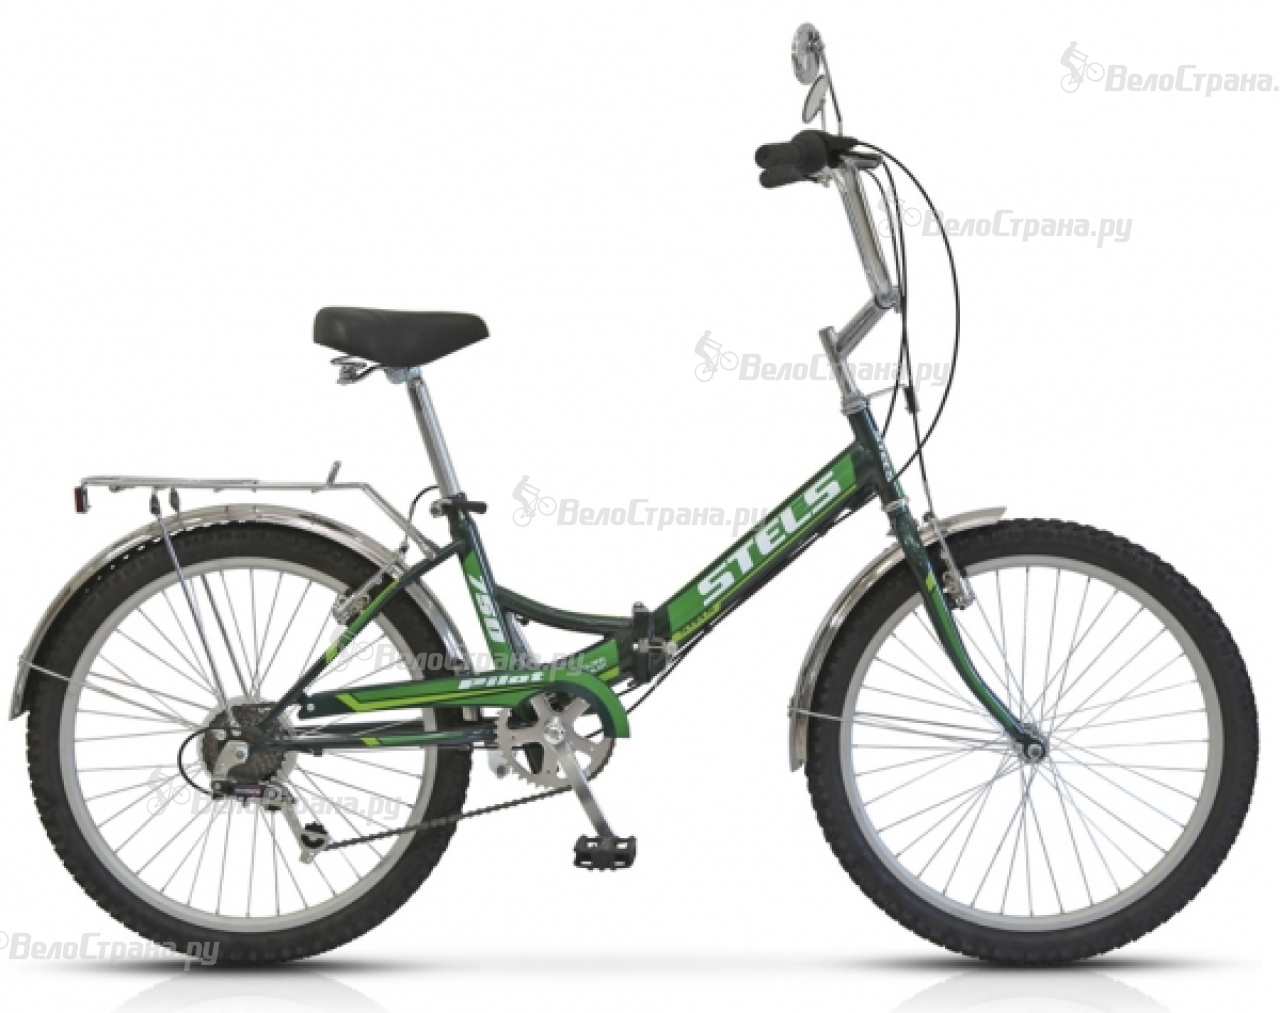 Велосипед Stels Pilot 750 (2013) велосипед stels navigator 380 2016